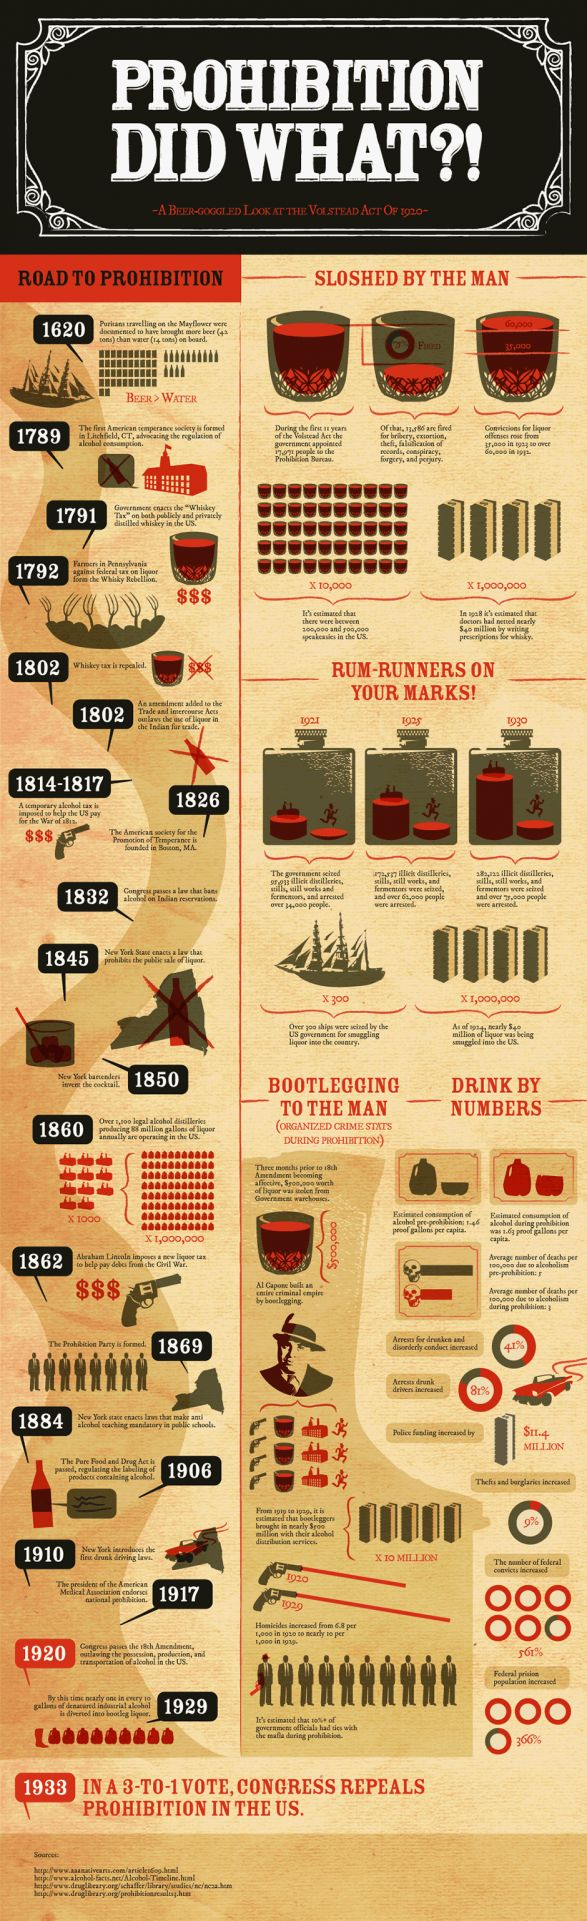 The Volstead Act of 1920!